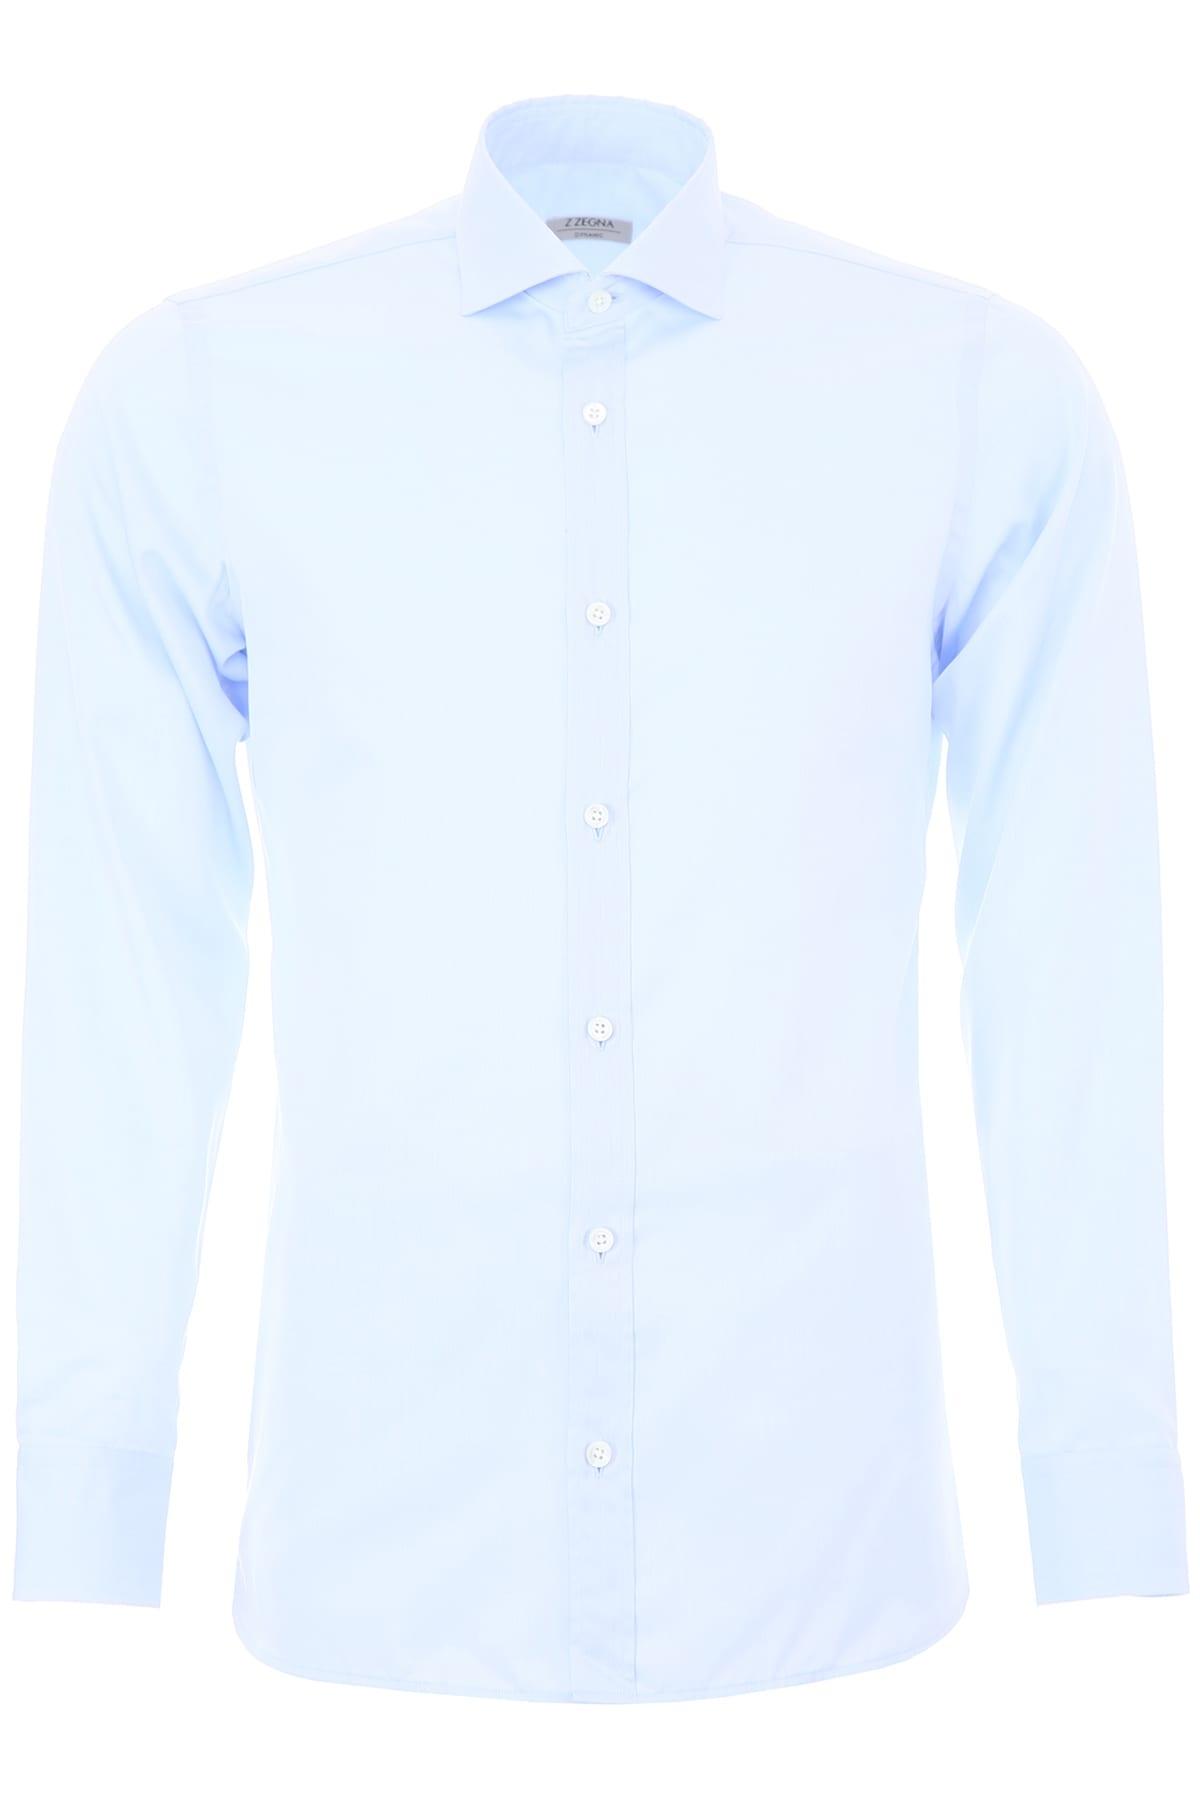 47b1c86c2a Z Zegna Dynamic Shirt